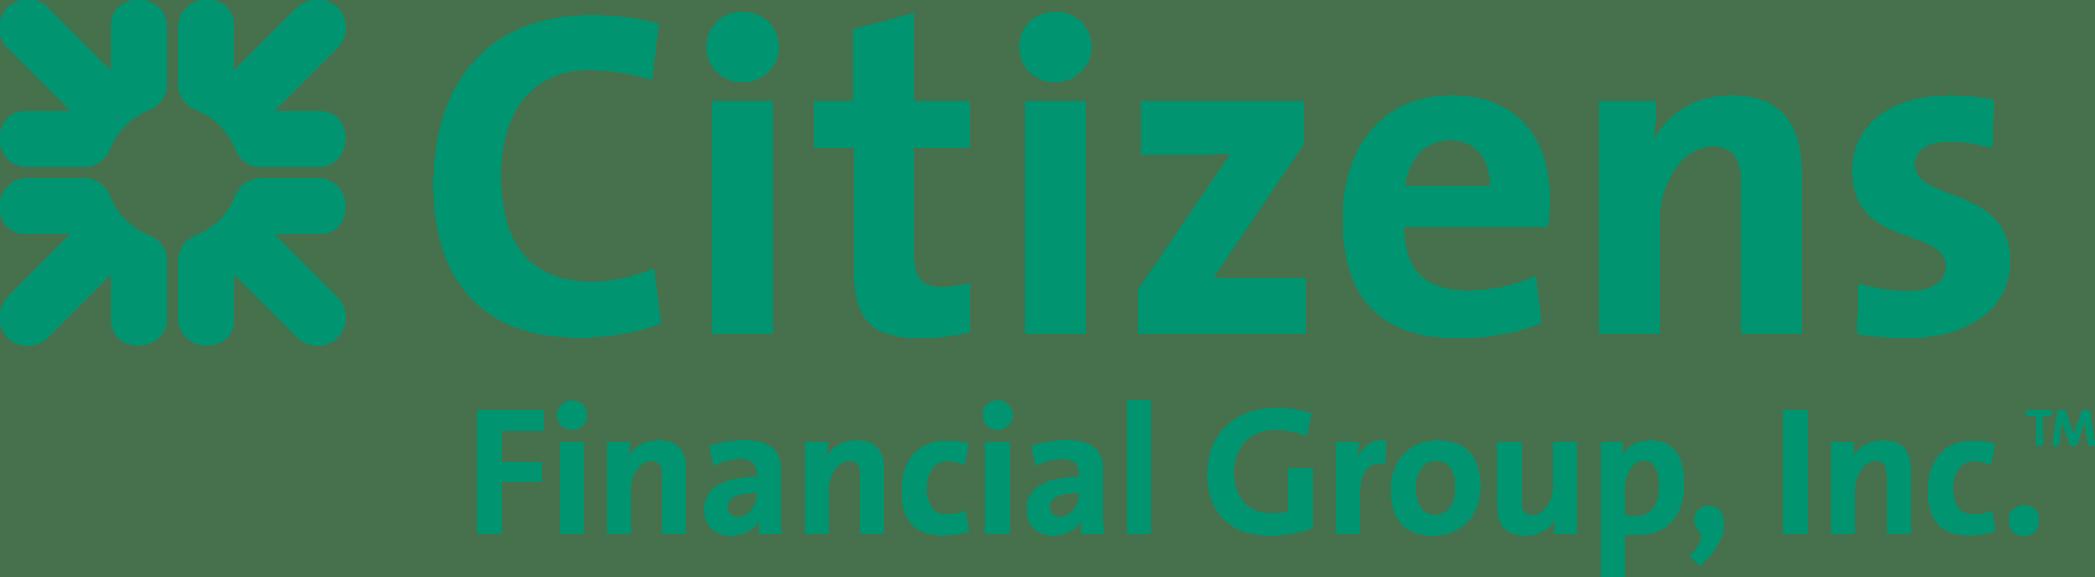 citizens-financial-group-inc-logo